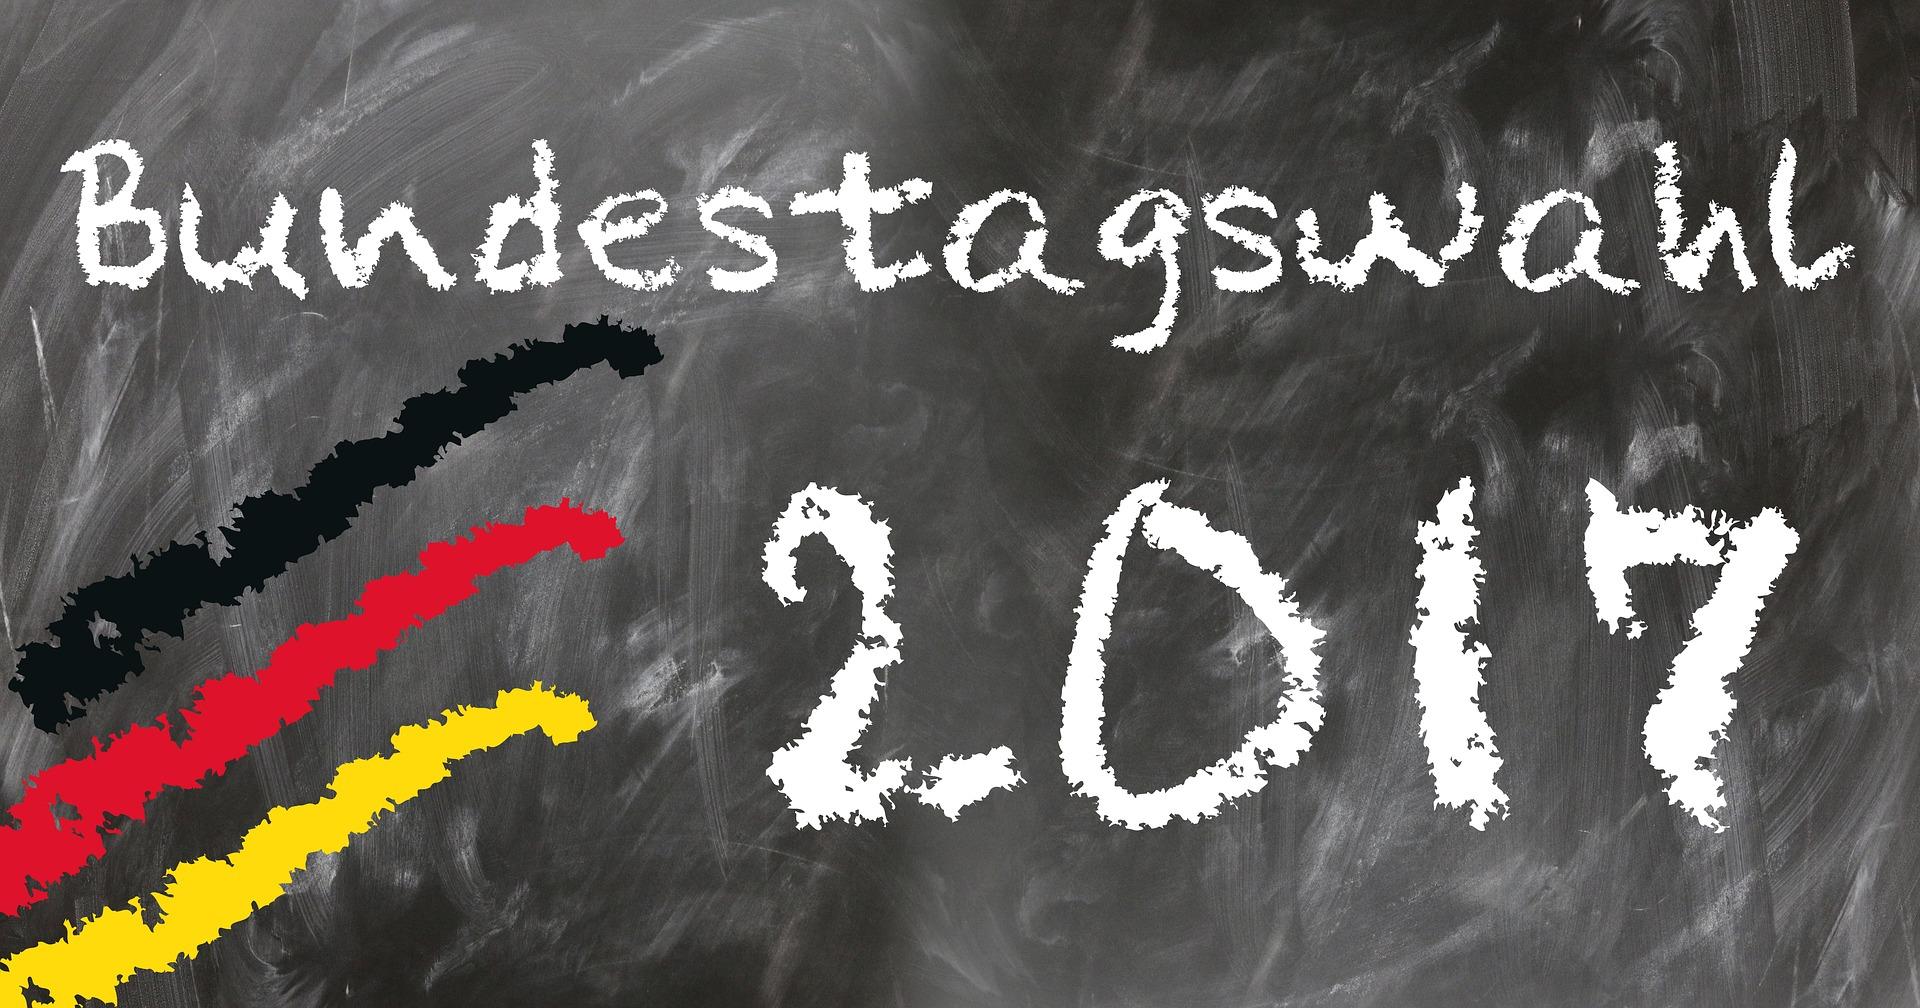 Bundestagswahl, Soziale Medien, Agentur Goldkind